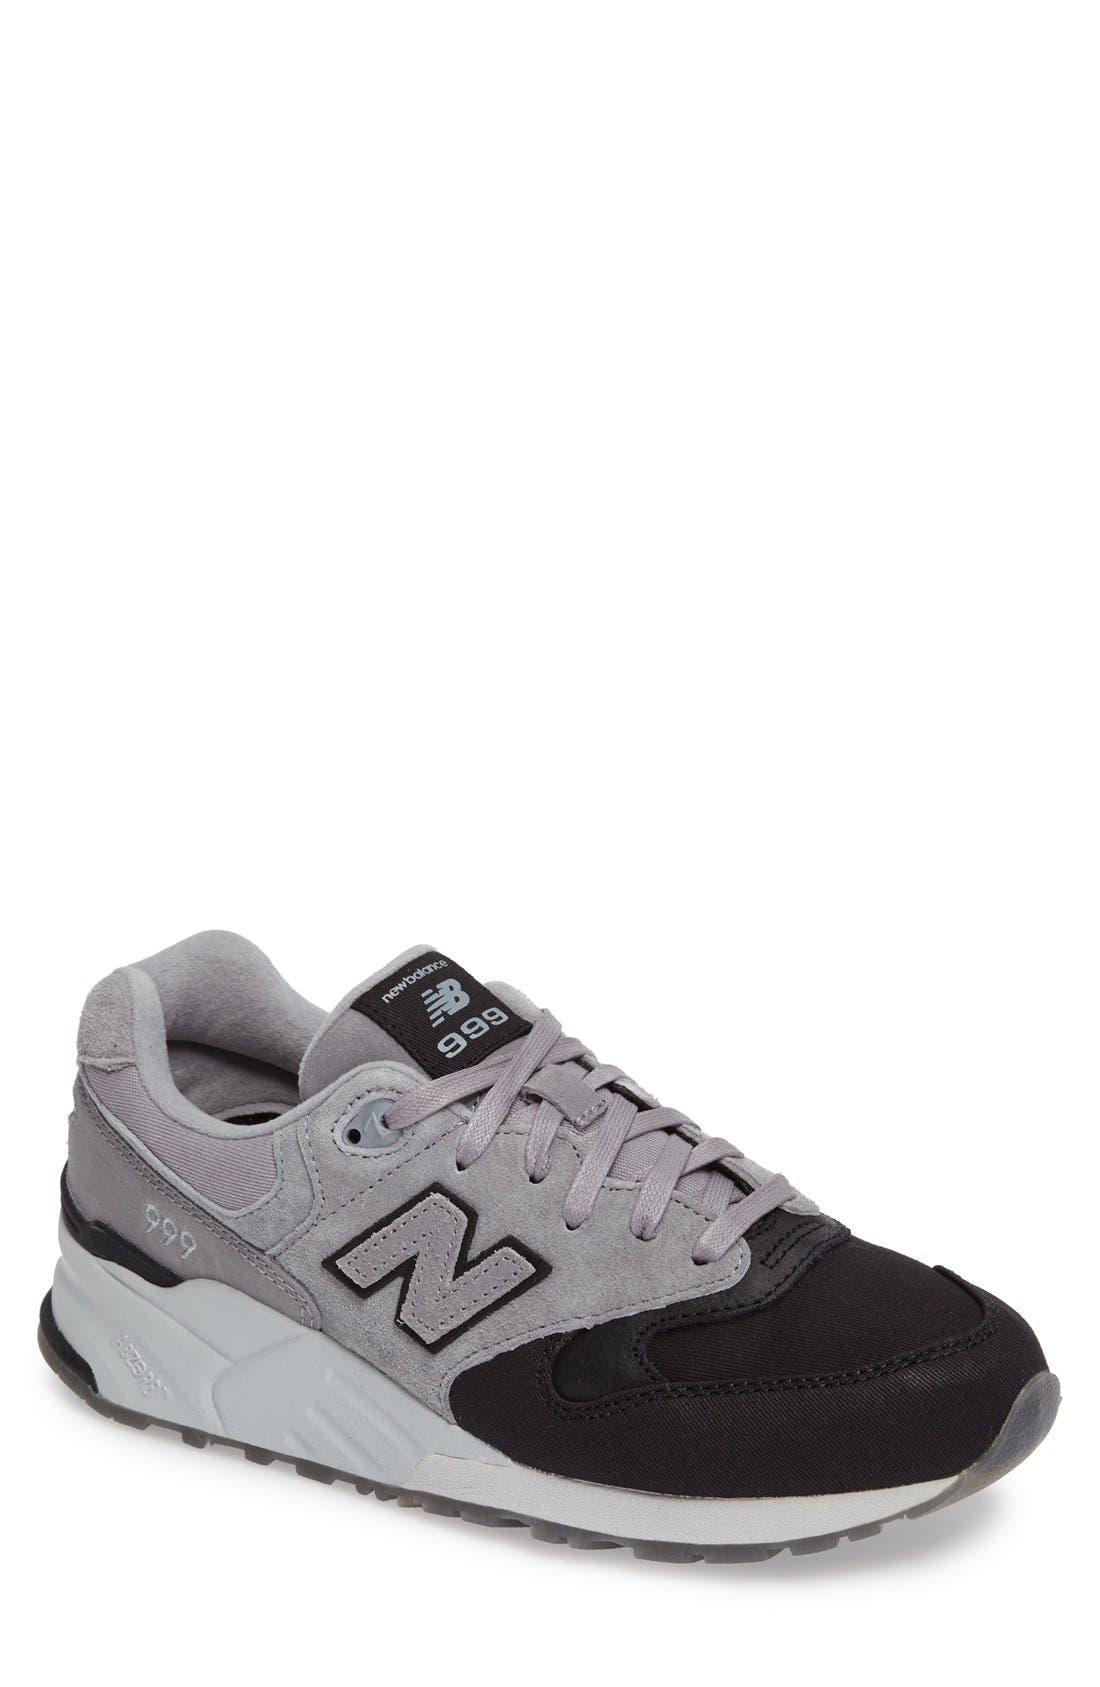 NEW BALANCE 999 Sneaker